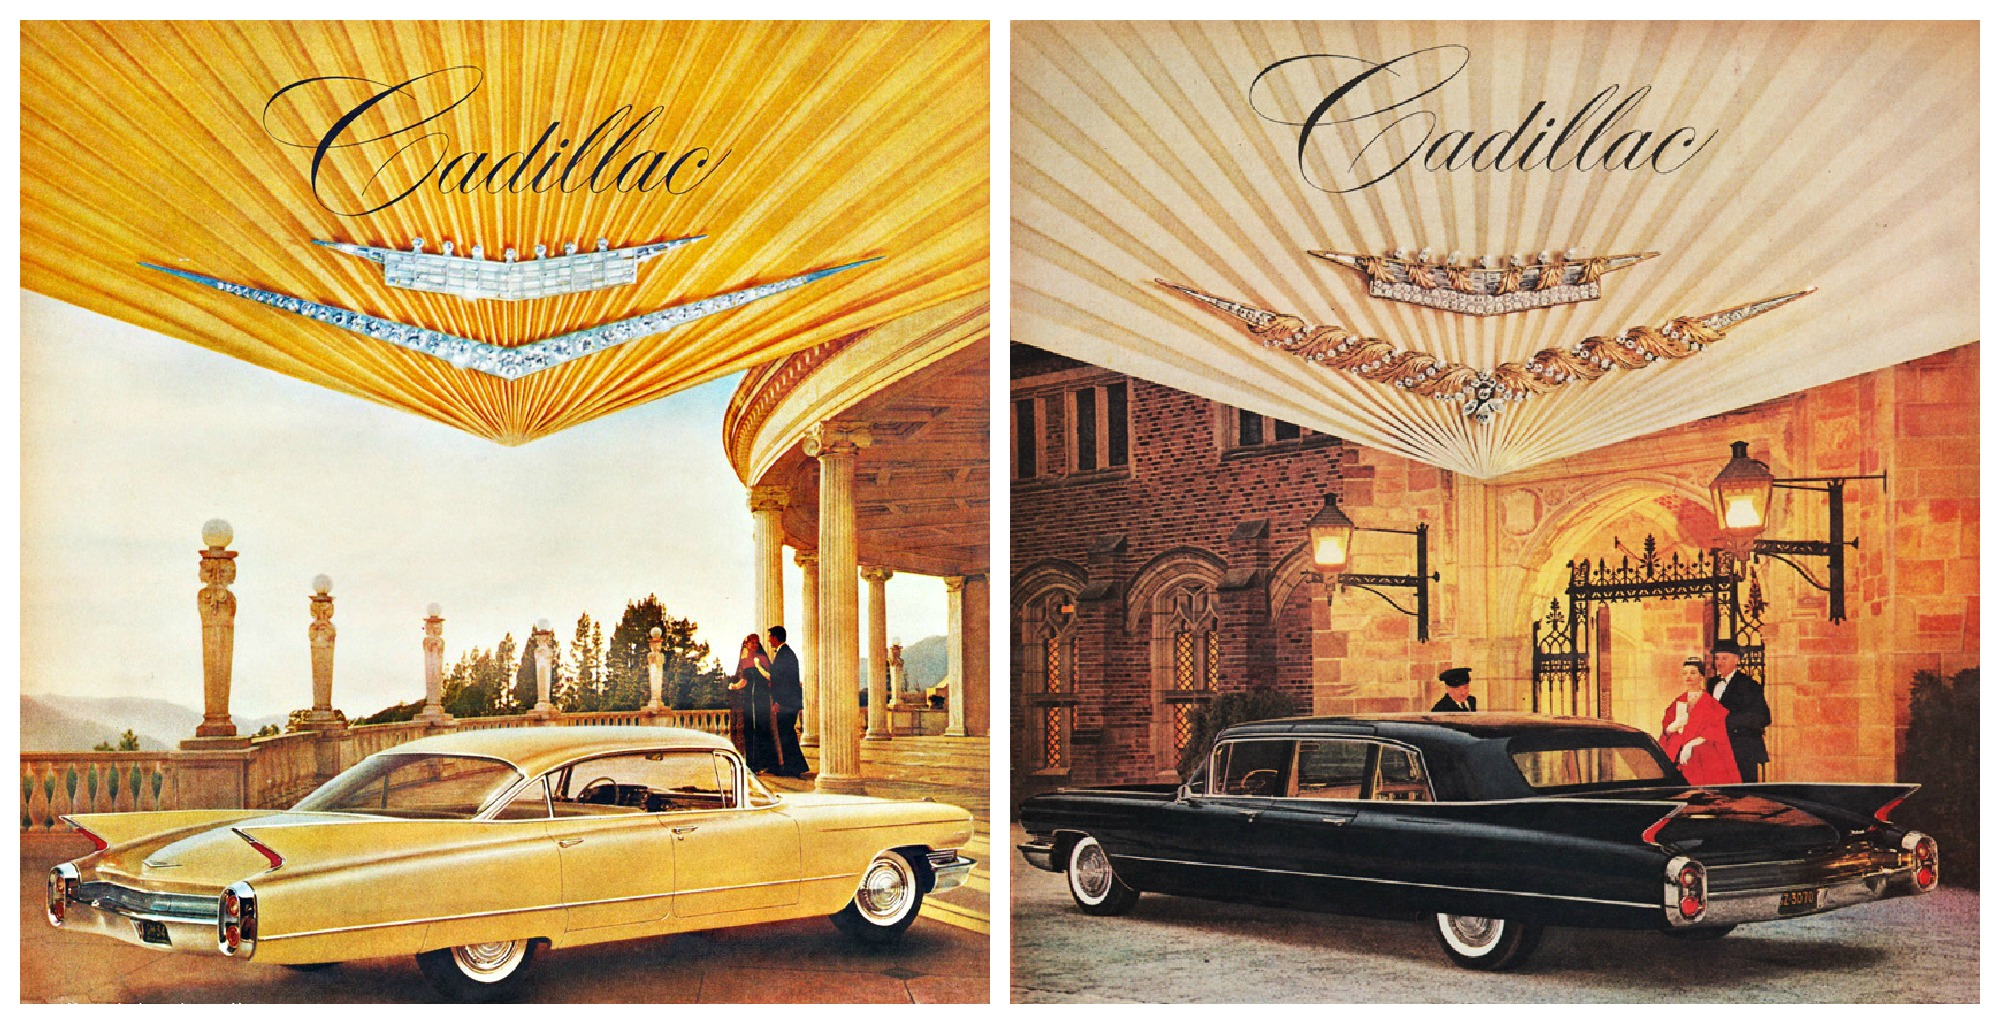 cadillac1960-collage.jpg